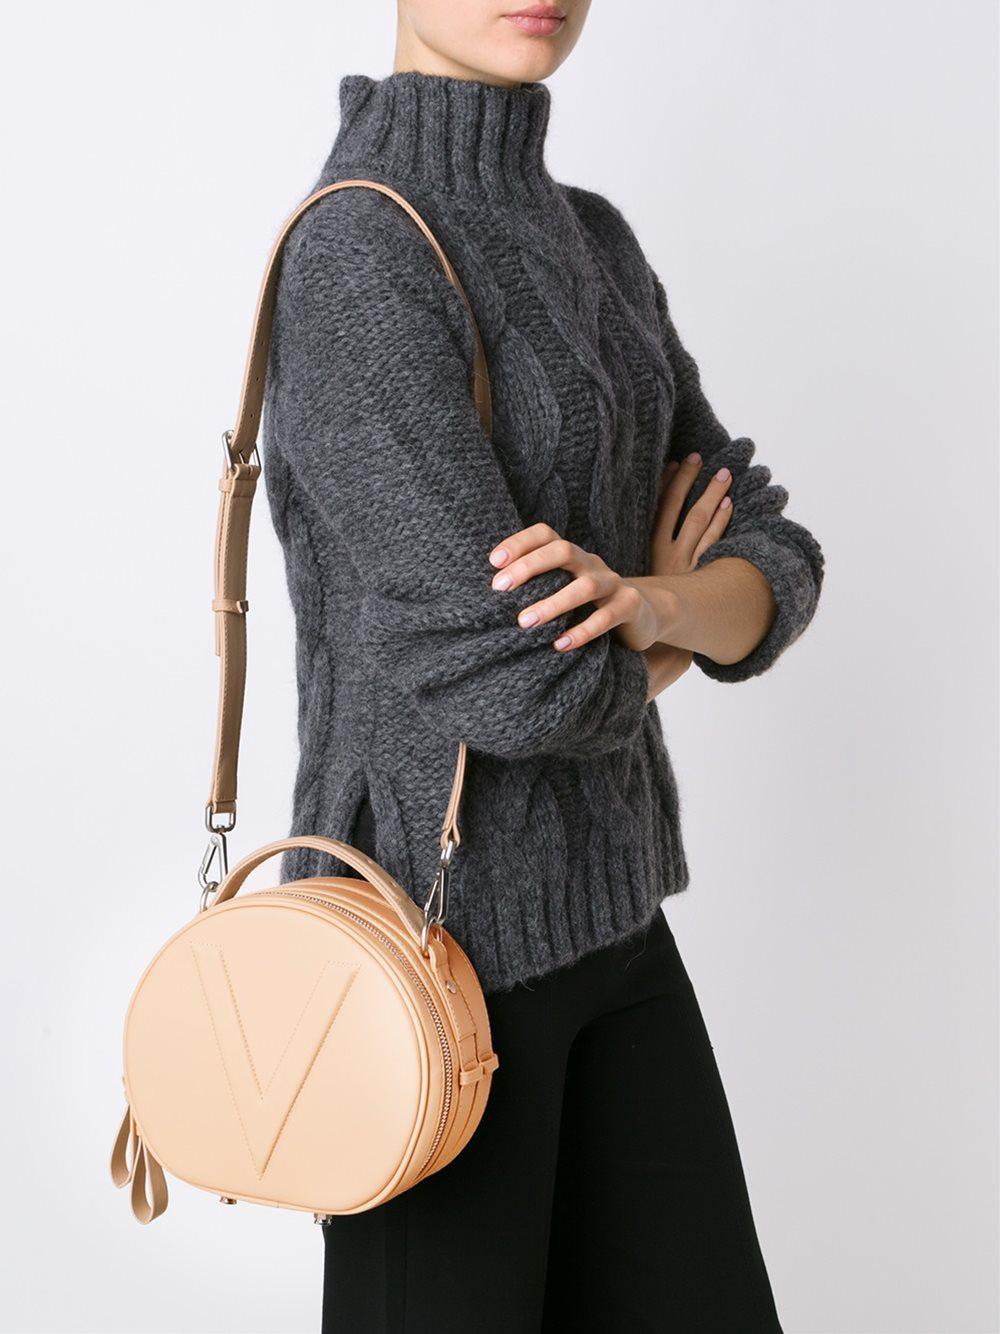 Valas Jean Leather Cross-Body Bag